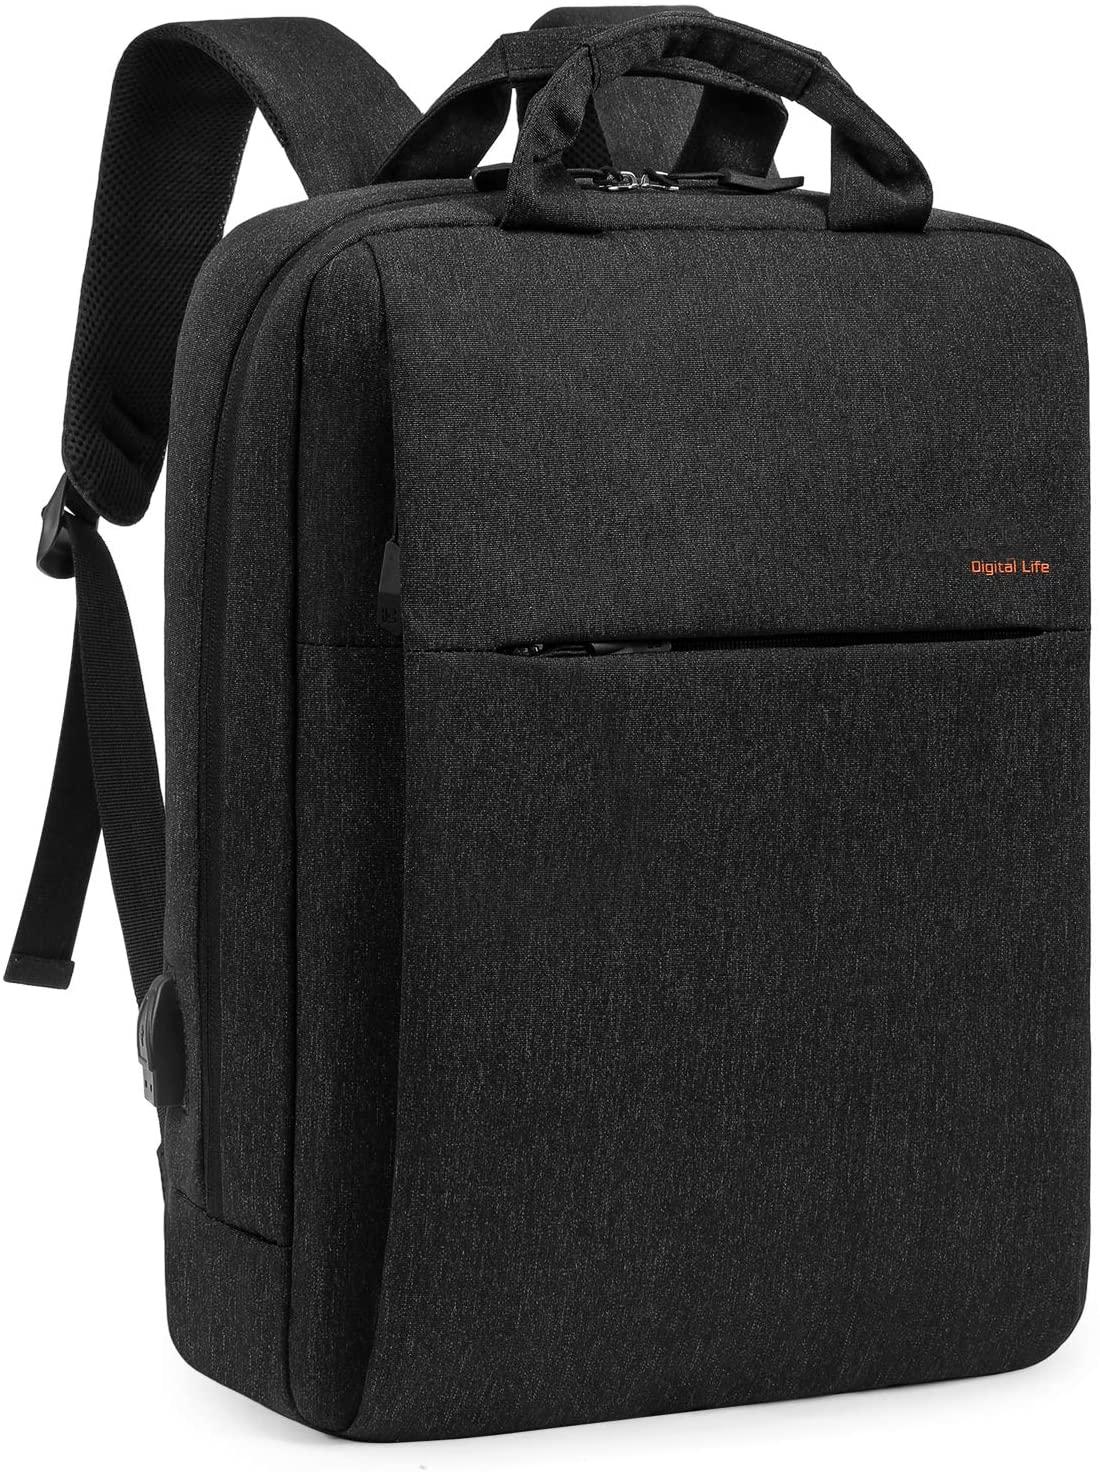 Laptop Backpack 15.6 Inch, Business Lightweight Backpack with USB Charging Port Water Resistant Computer Bag College Backpack Rucksack Bookbag Slim Travel Backpack Casual Daypack for Men Women, Black